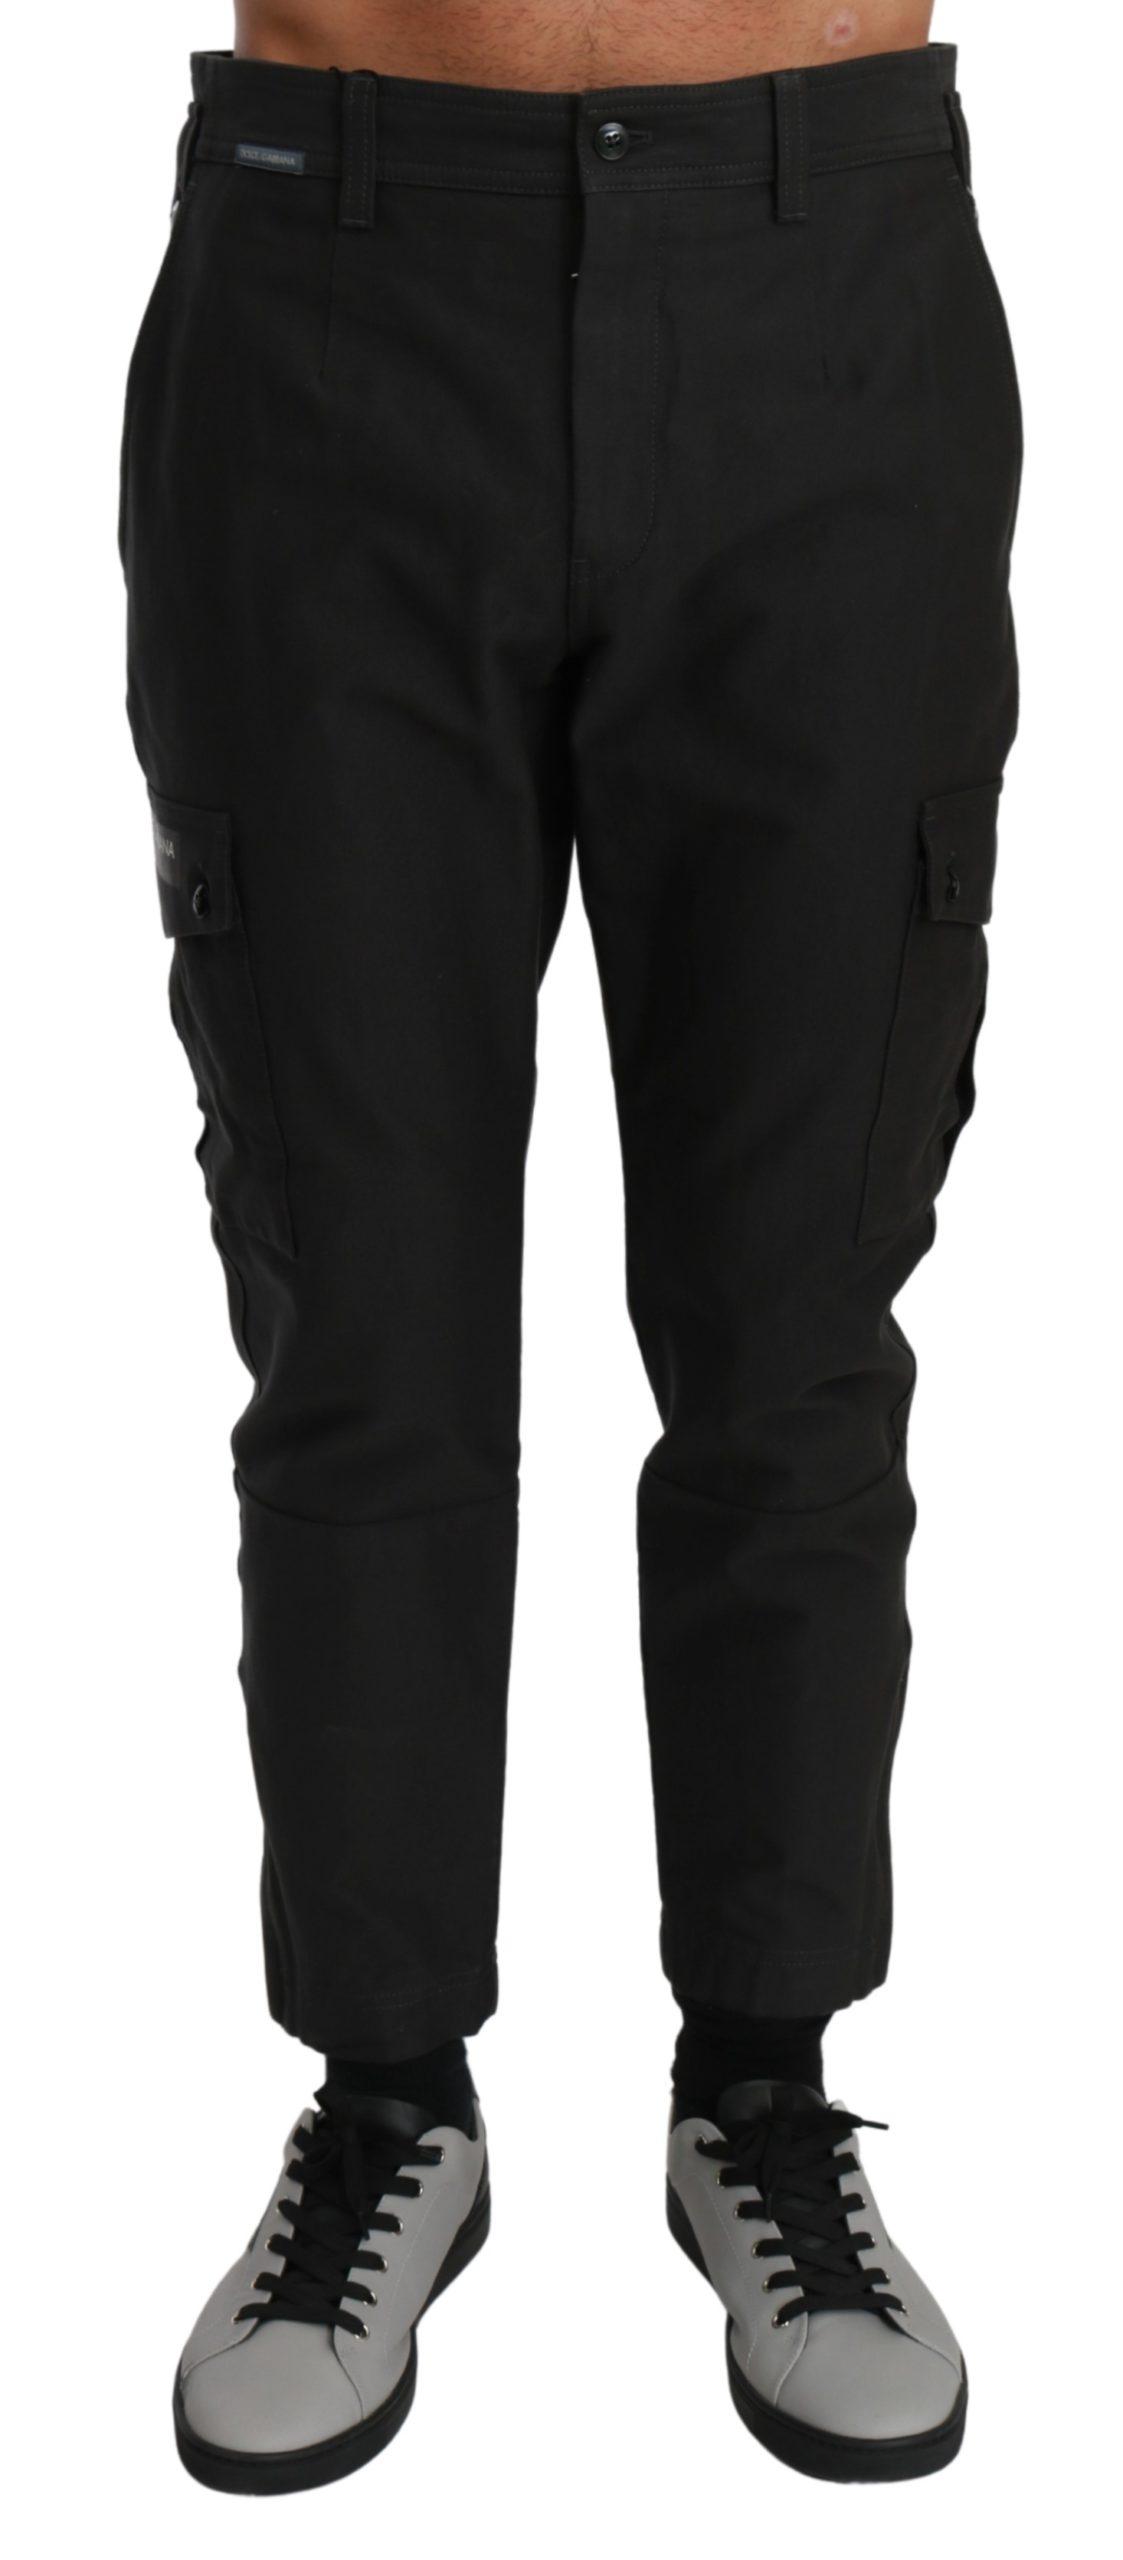 Dolce & Gabbana Men's Cargo Casual Cotton Trouser Gray PAN70991 - IT48 | M